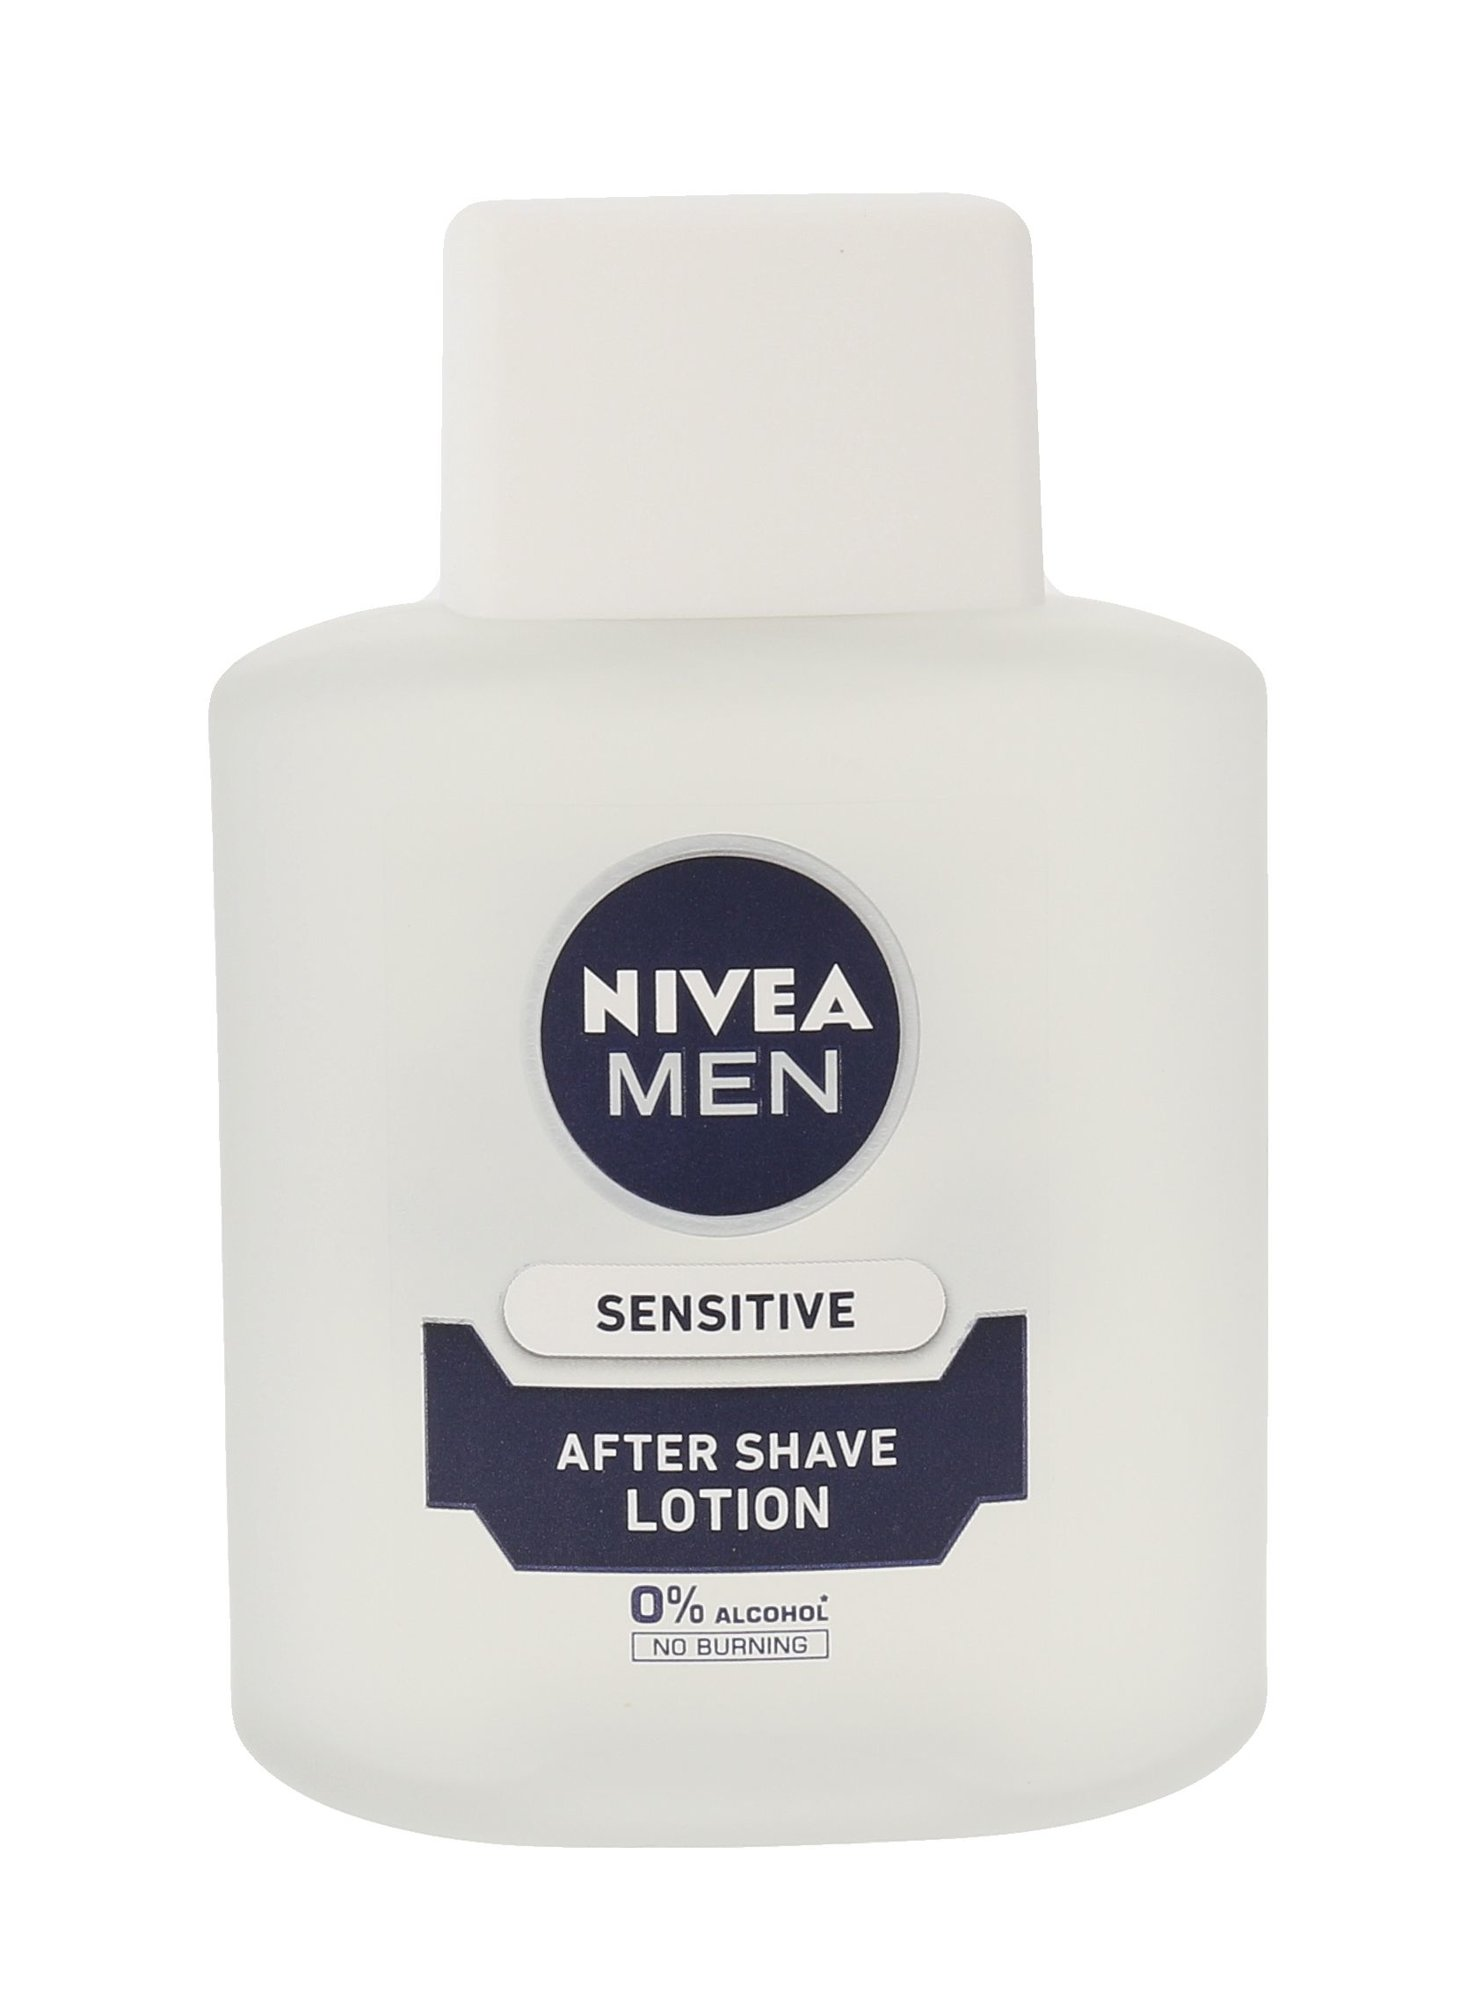 Skutimosi priemonė Nivea Men Sensitive After Shave Lotion